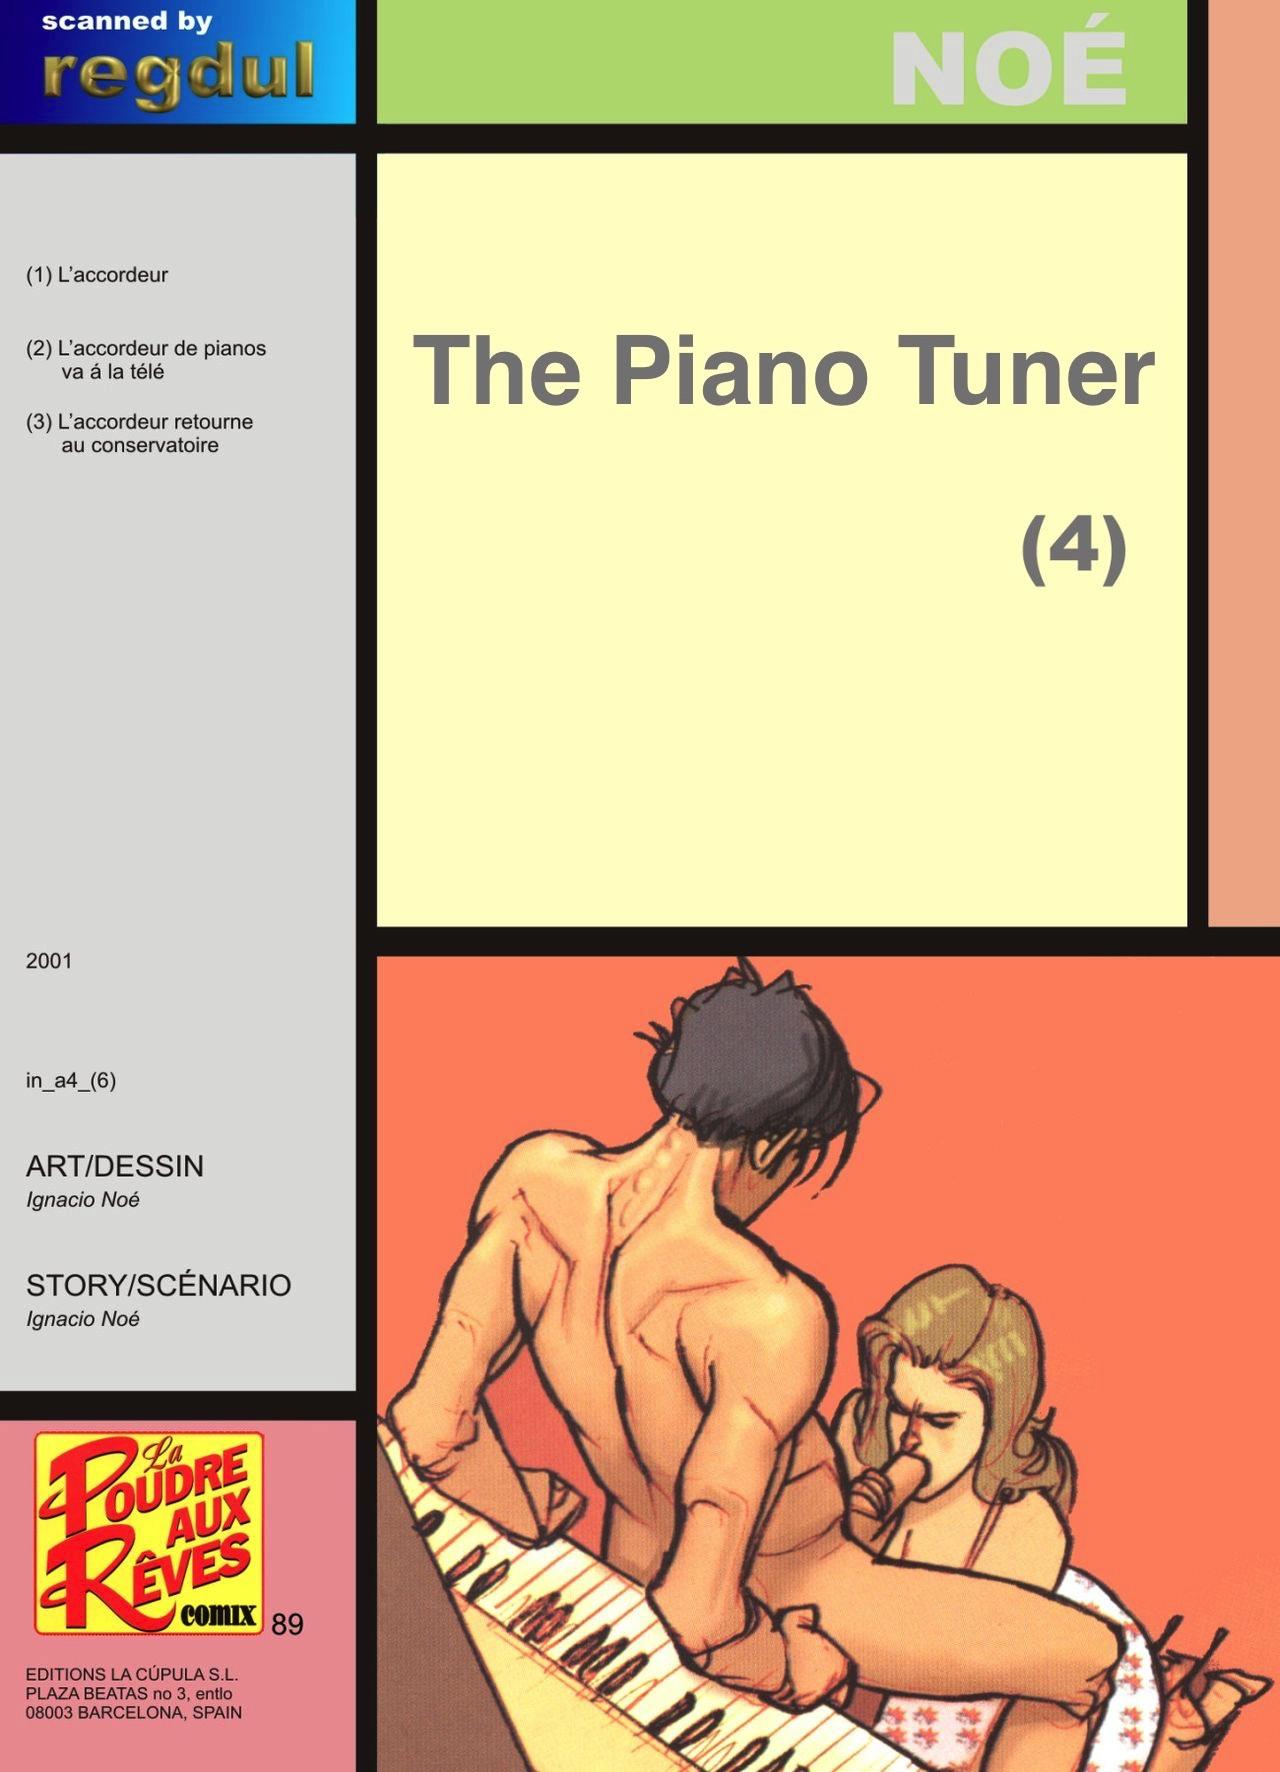 The Piano Tuner 4- Ignacio noe image 1